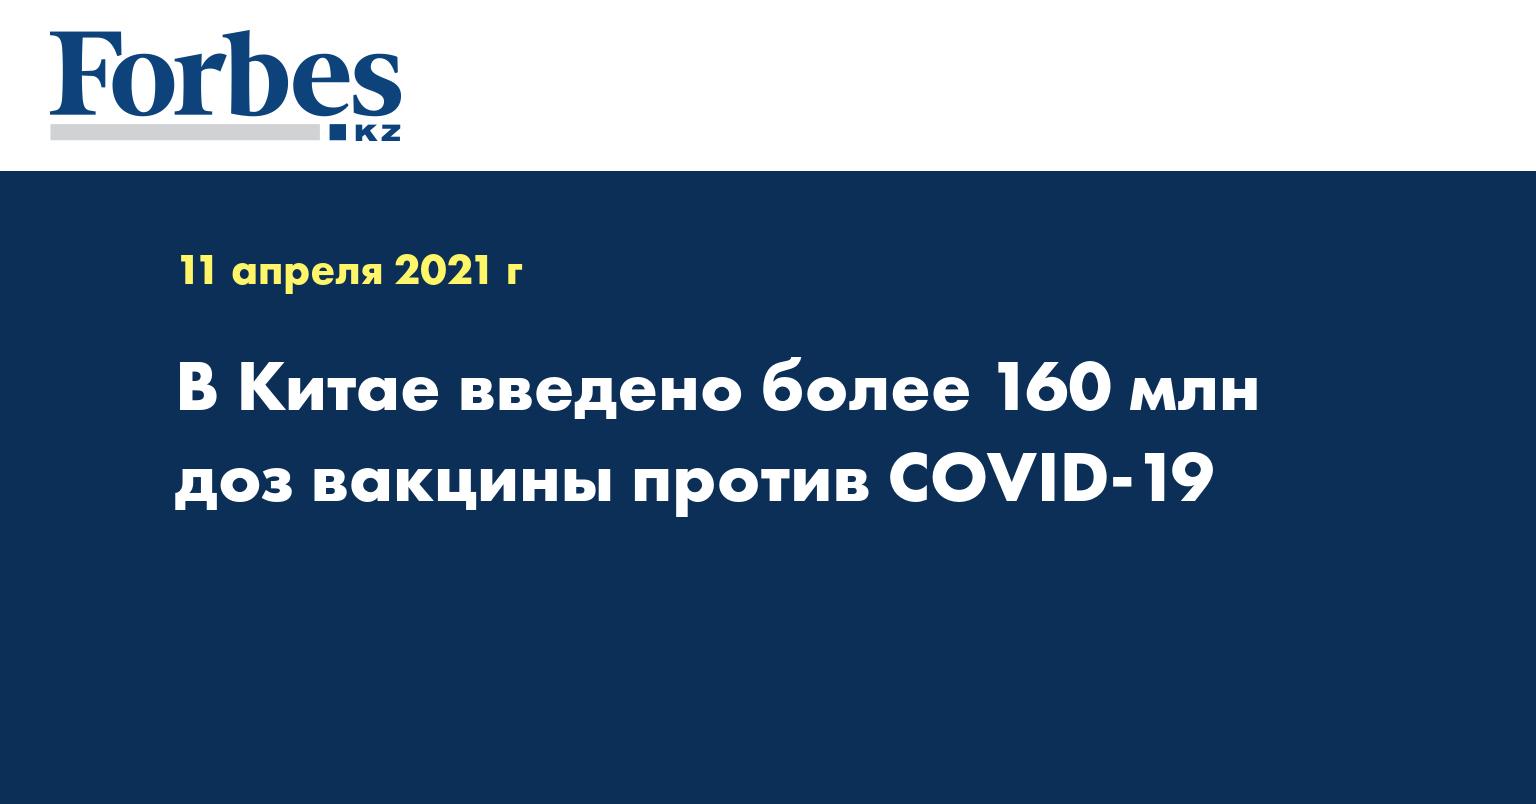 В Китае введено более 160 млн доз вакцины против COVID-19